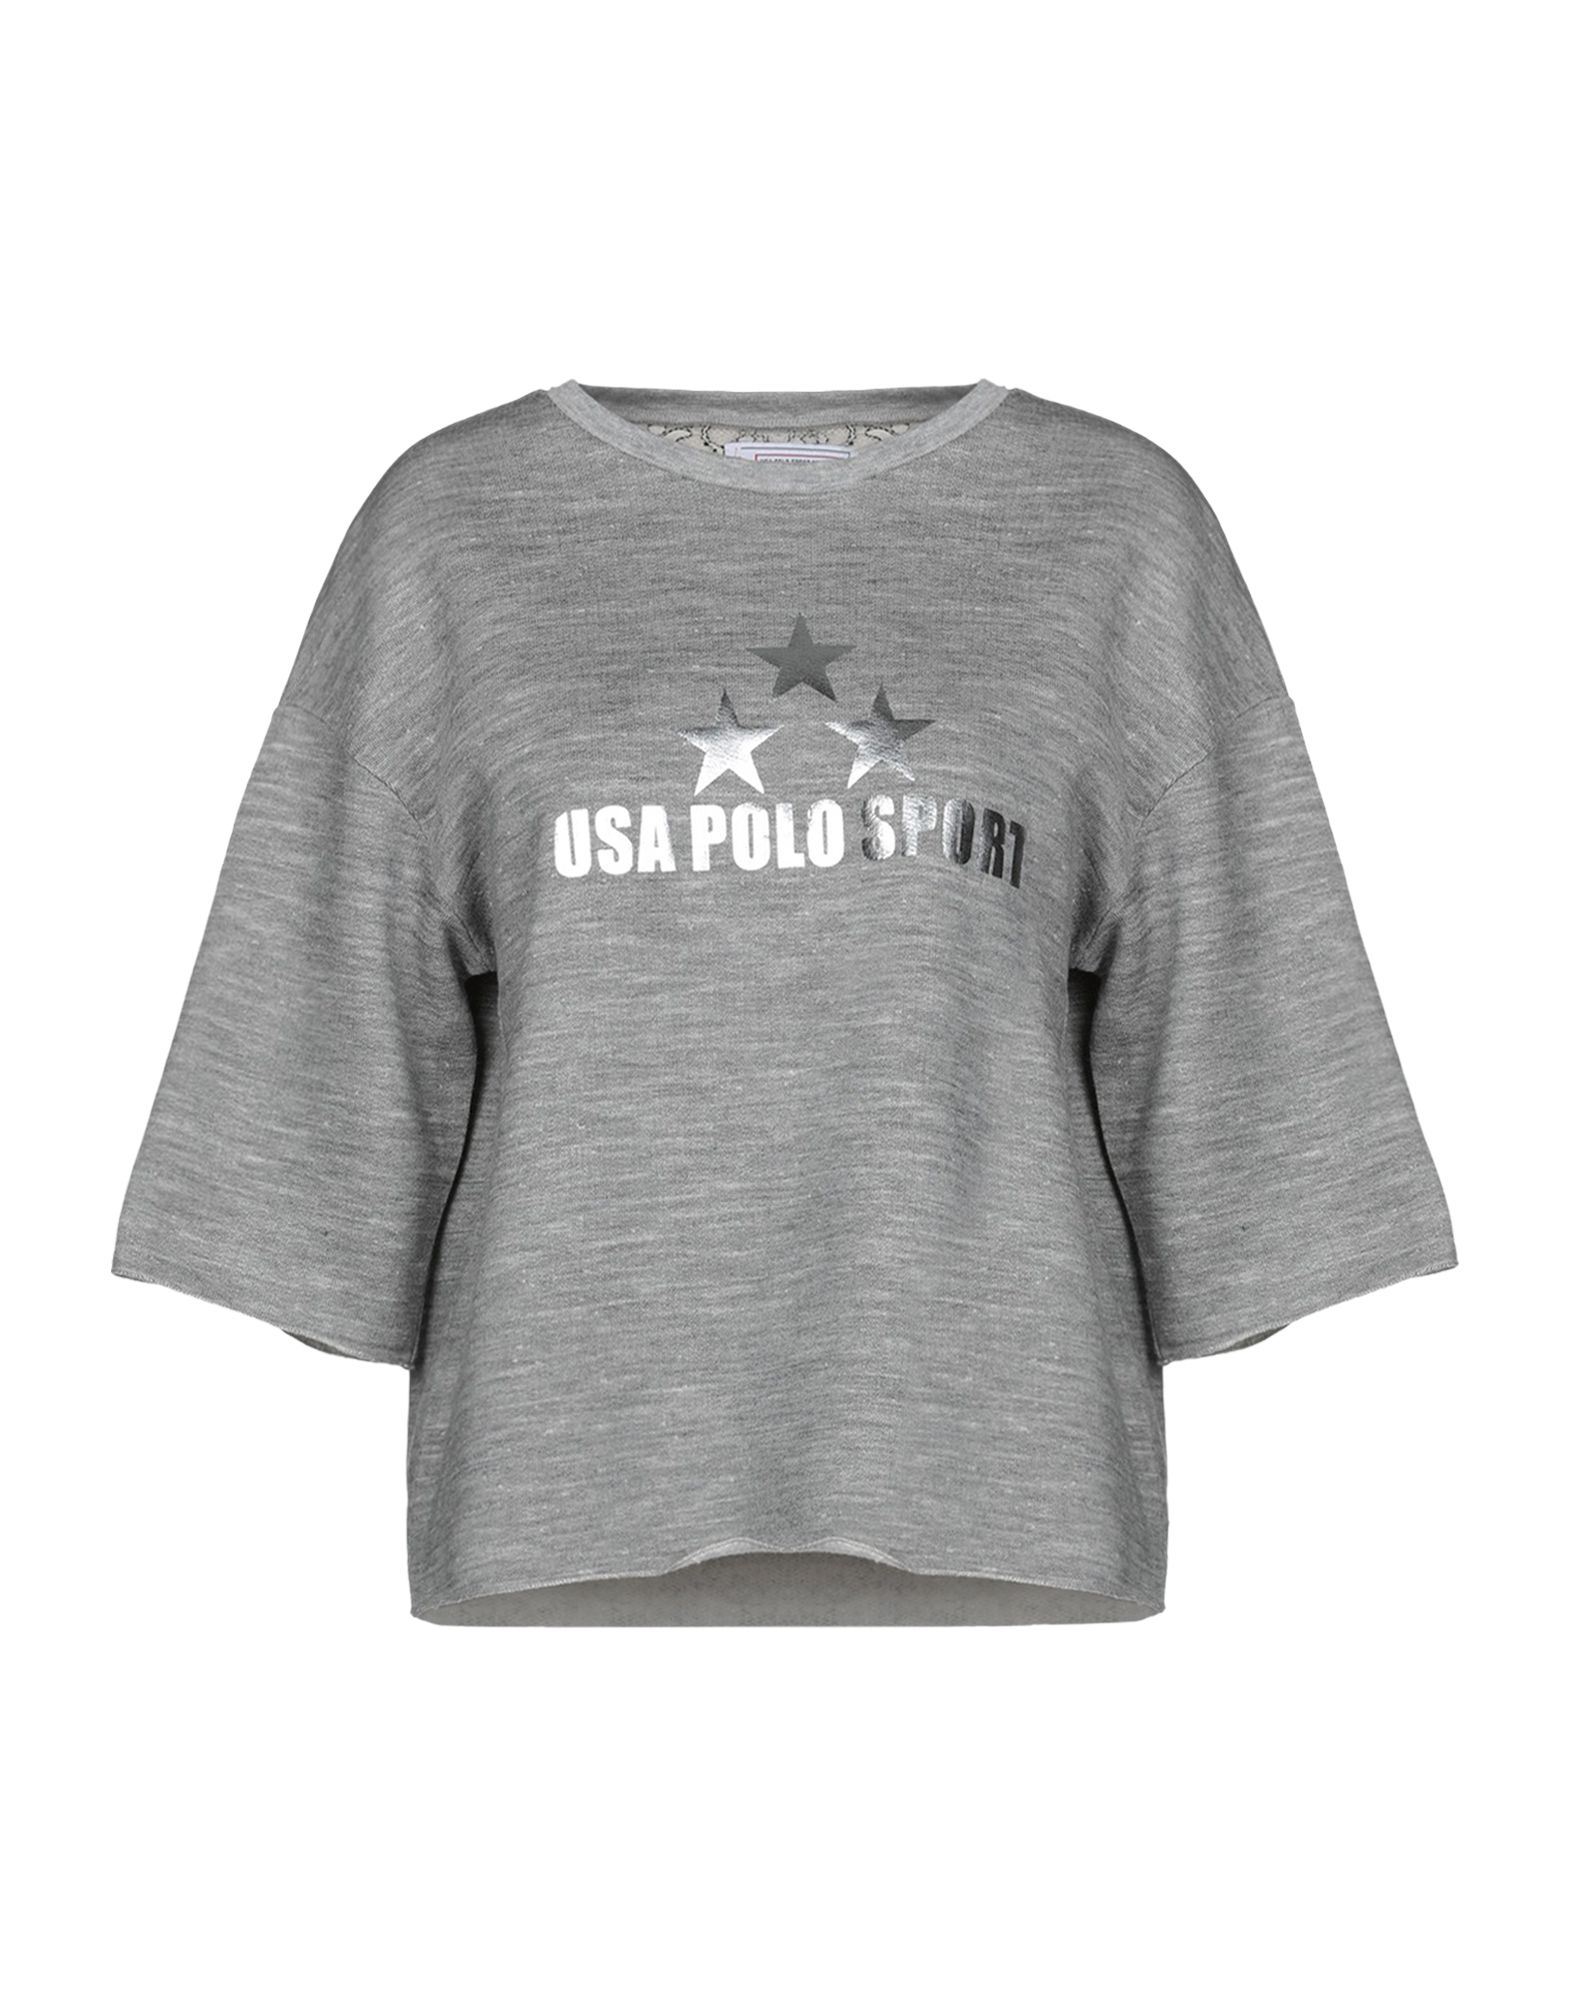 Фото - USA POLO SPORT Толстовка peter hadley sport футболка